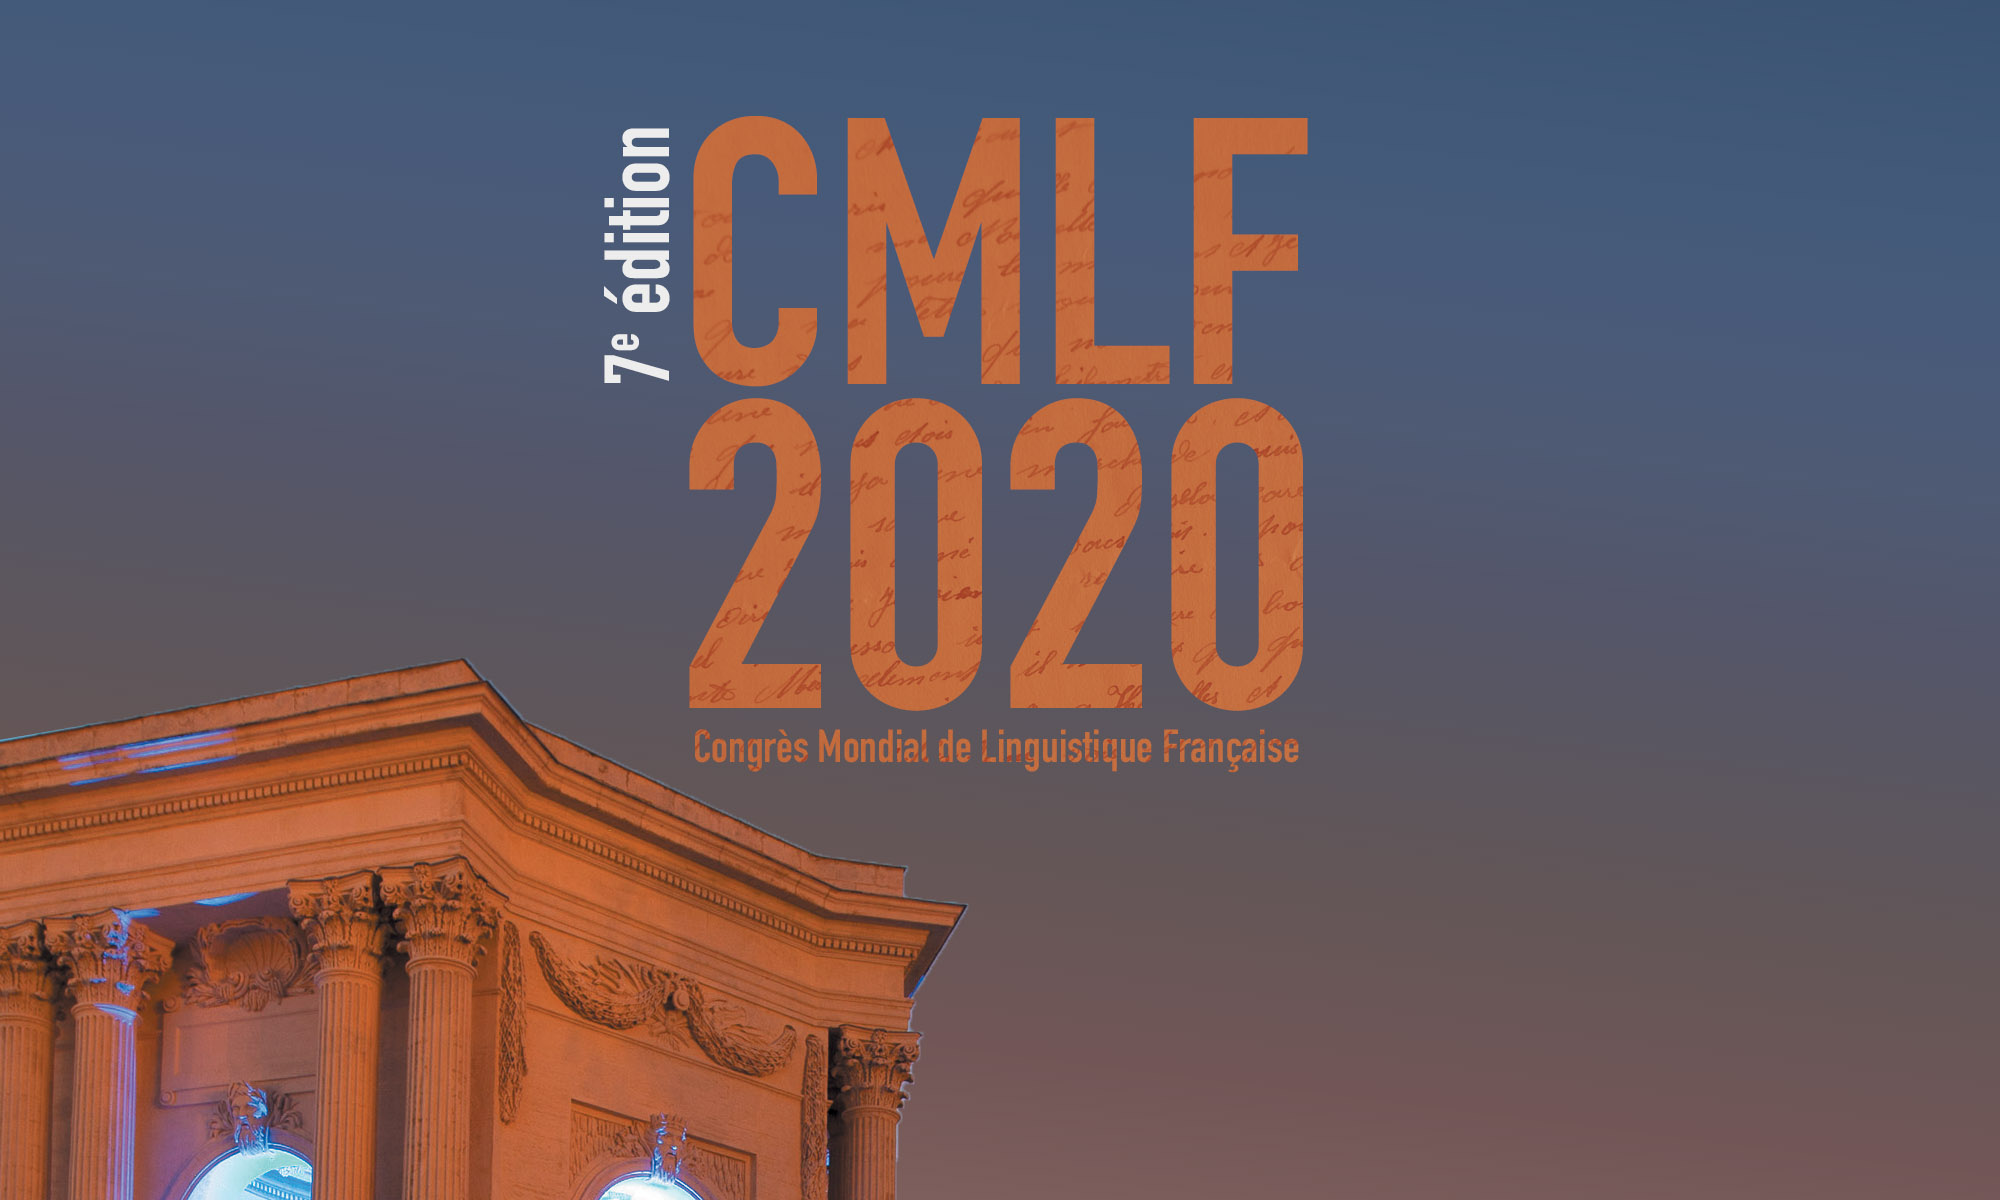 CMLF2020